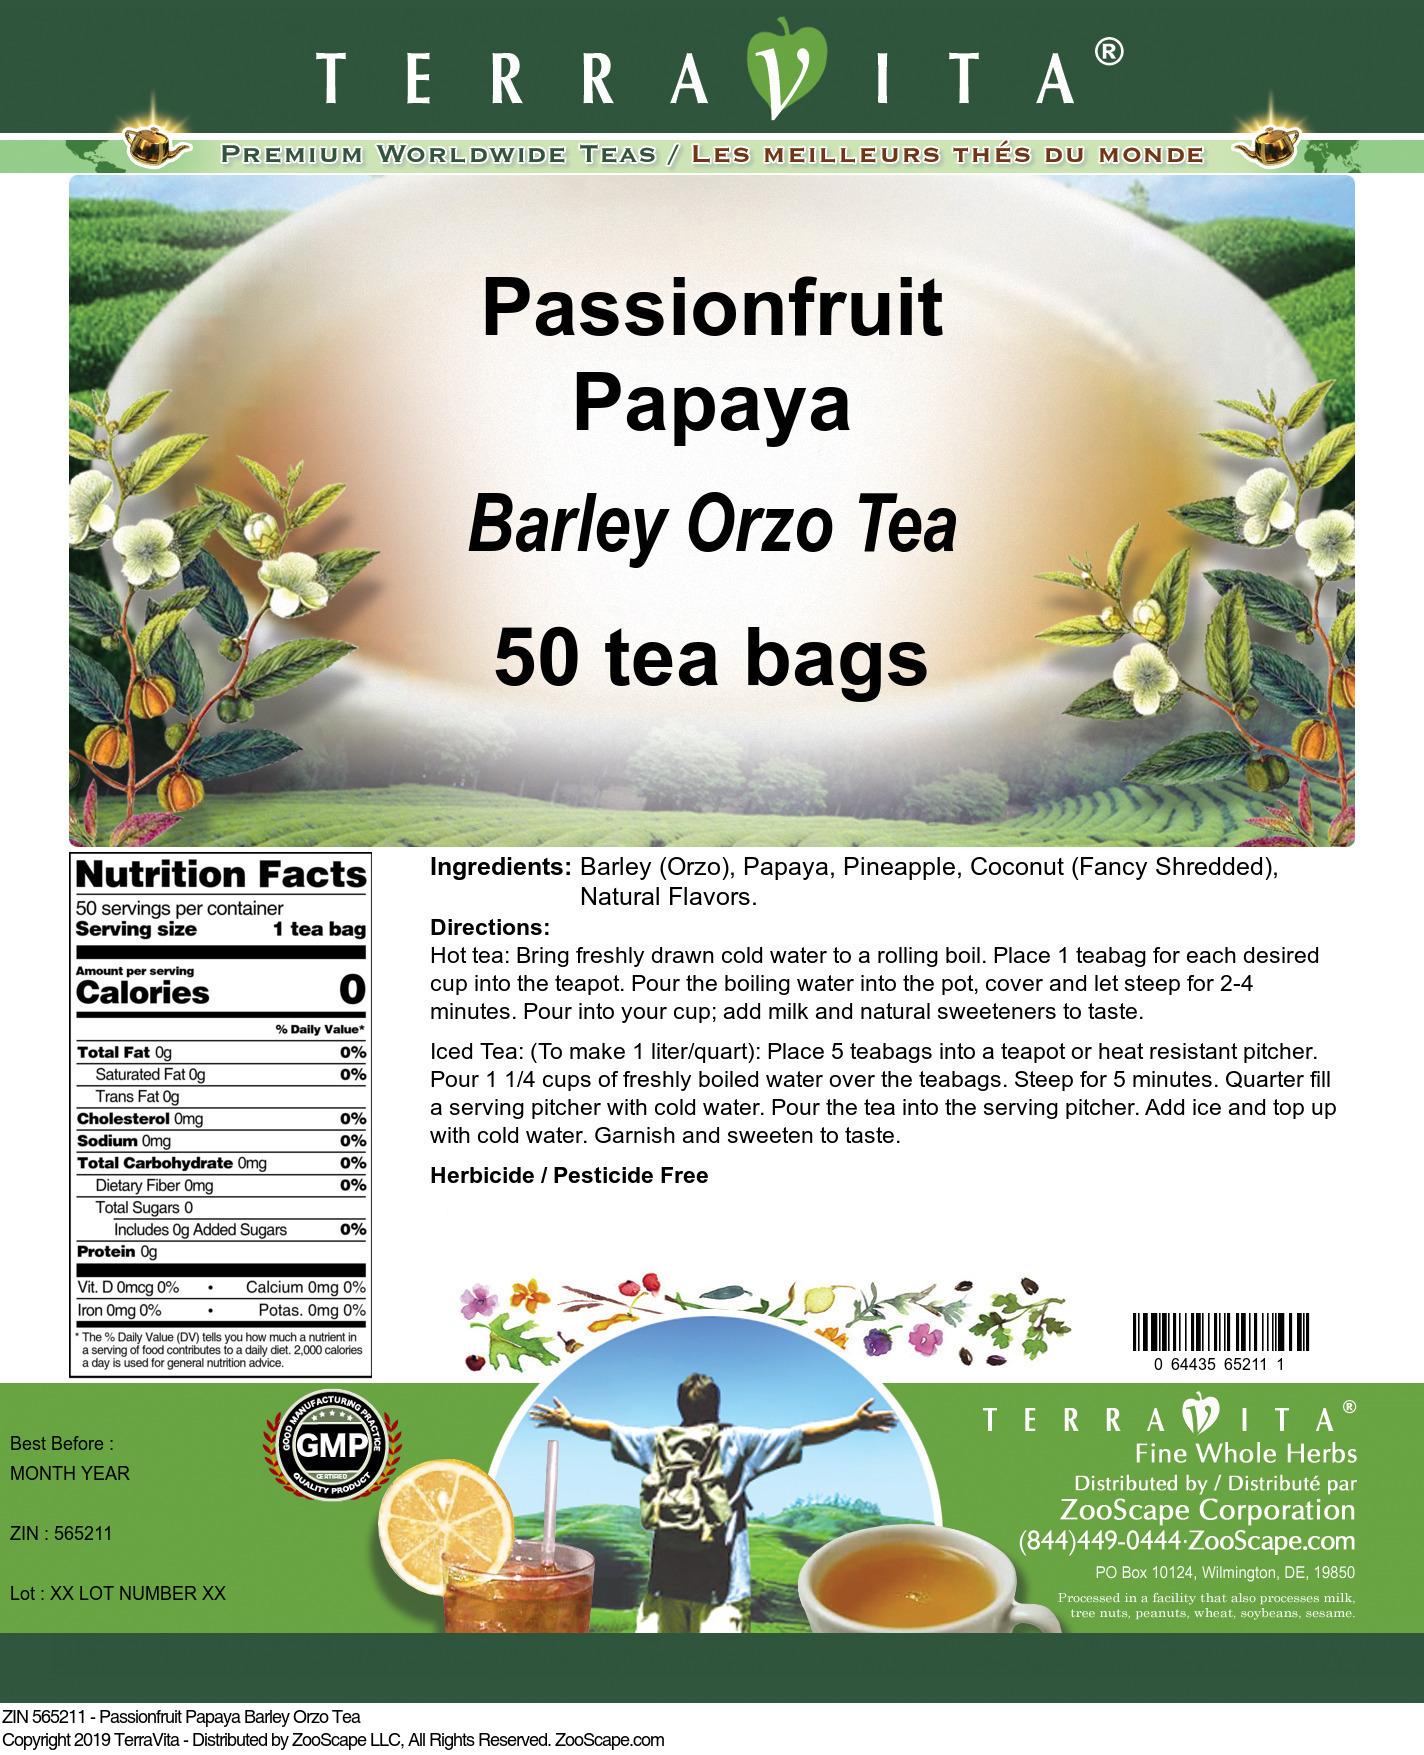 Passionfruit Papaya Barley Orzo